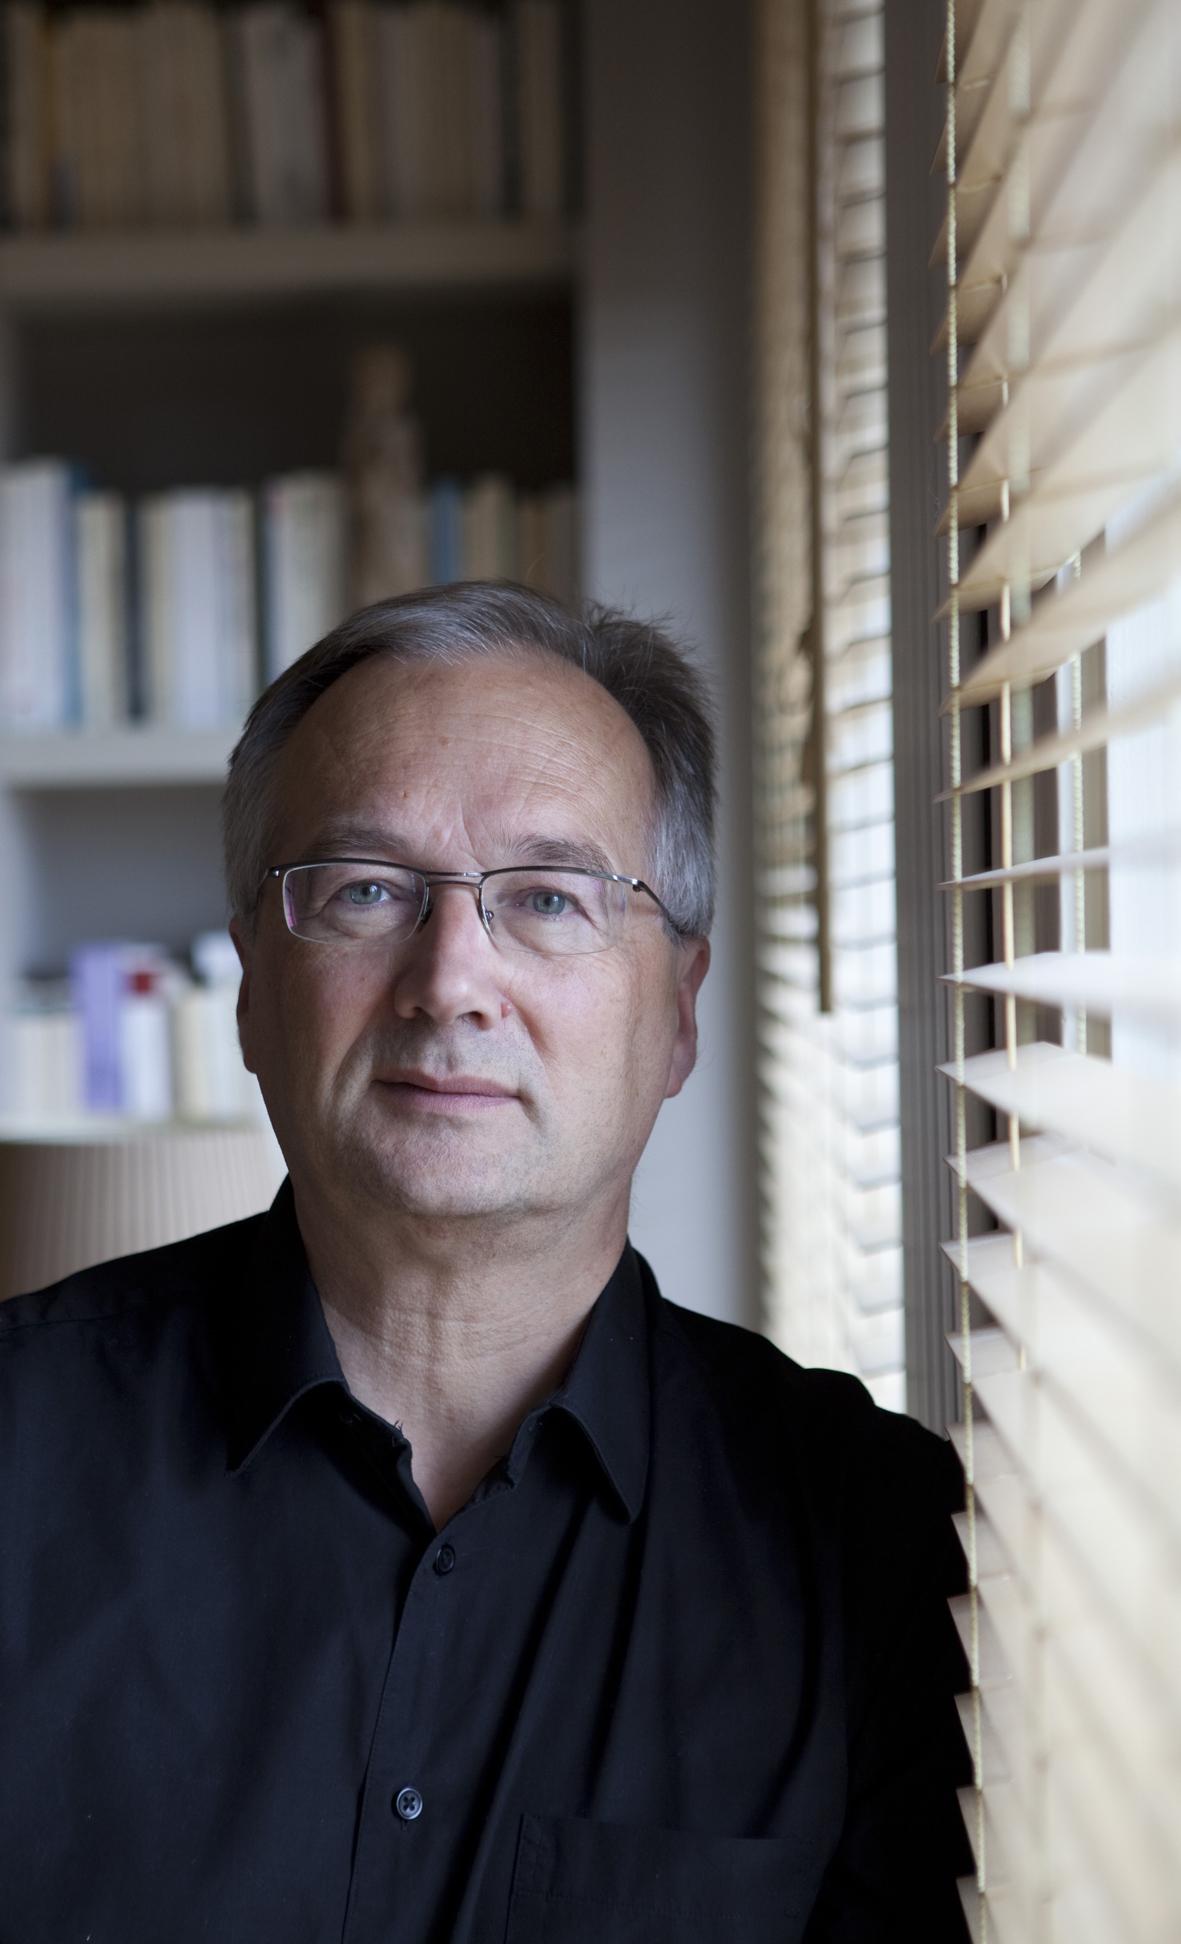 Bernard Friot Crivain Wikipdia